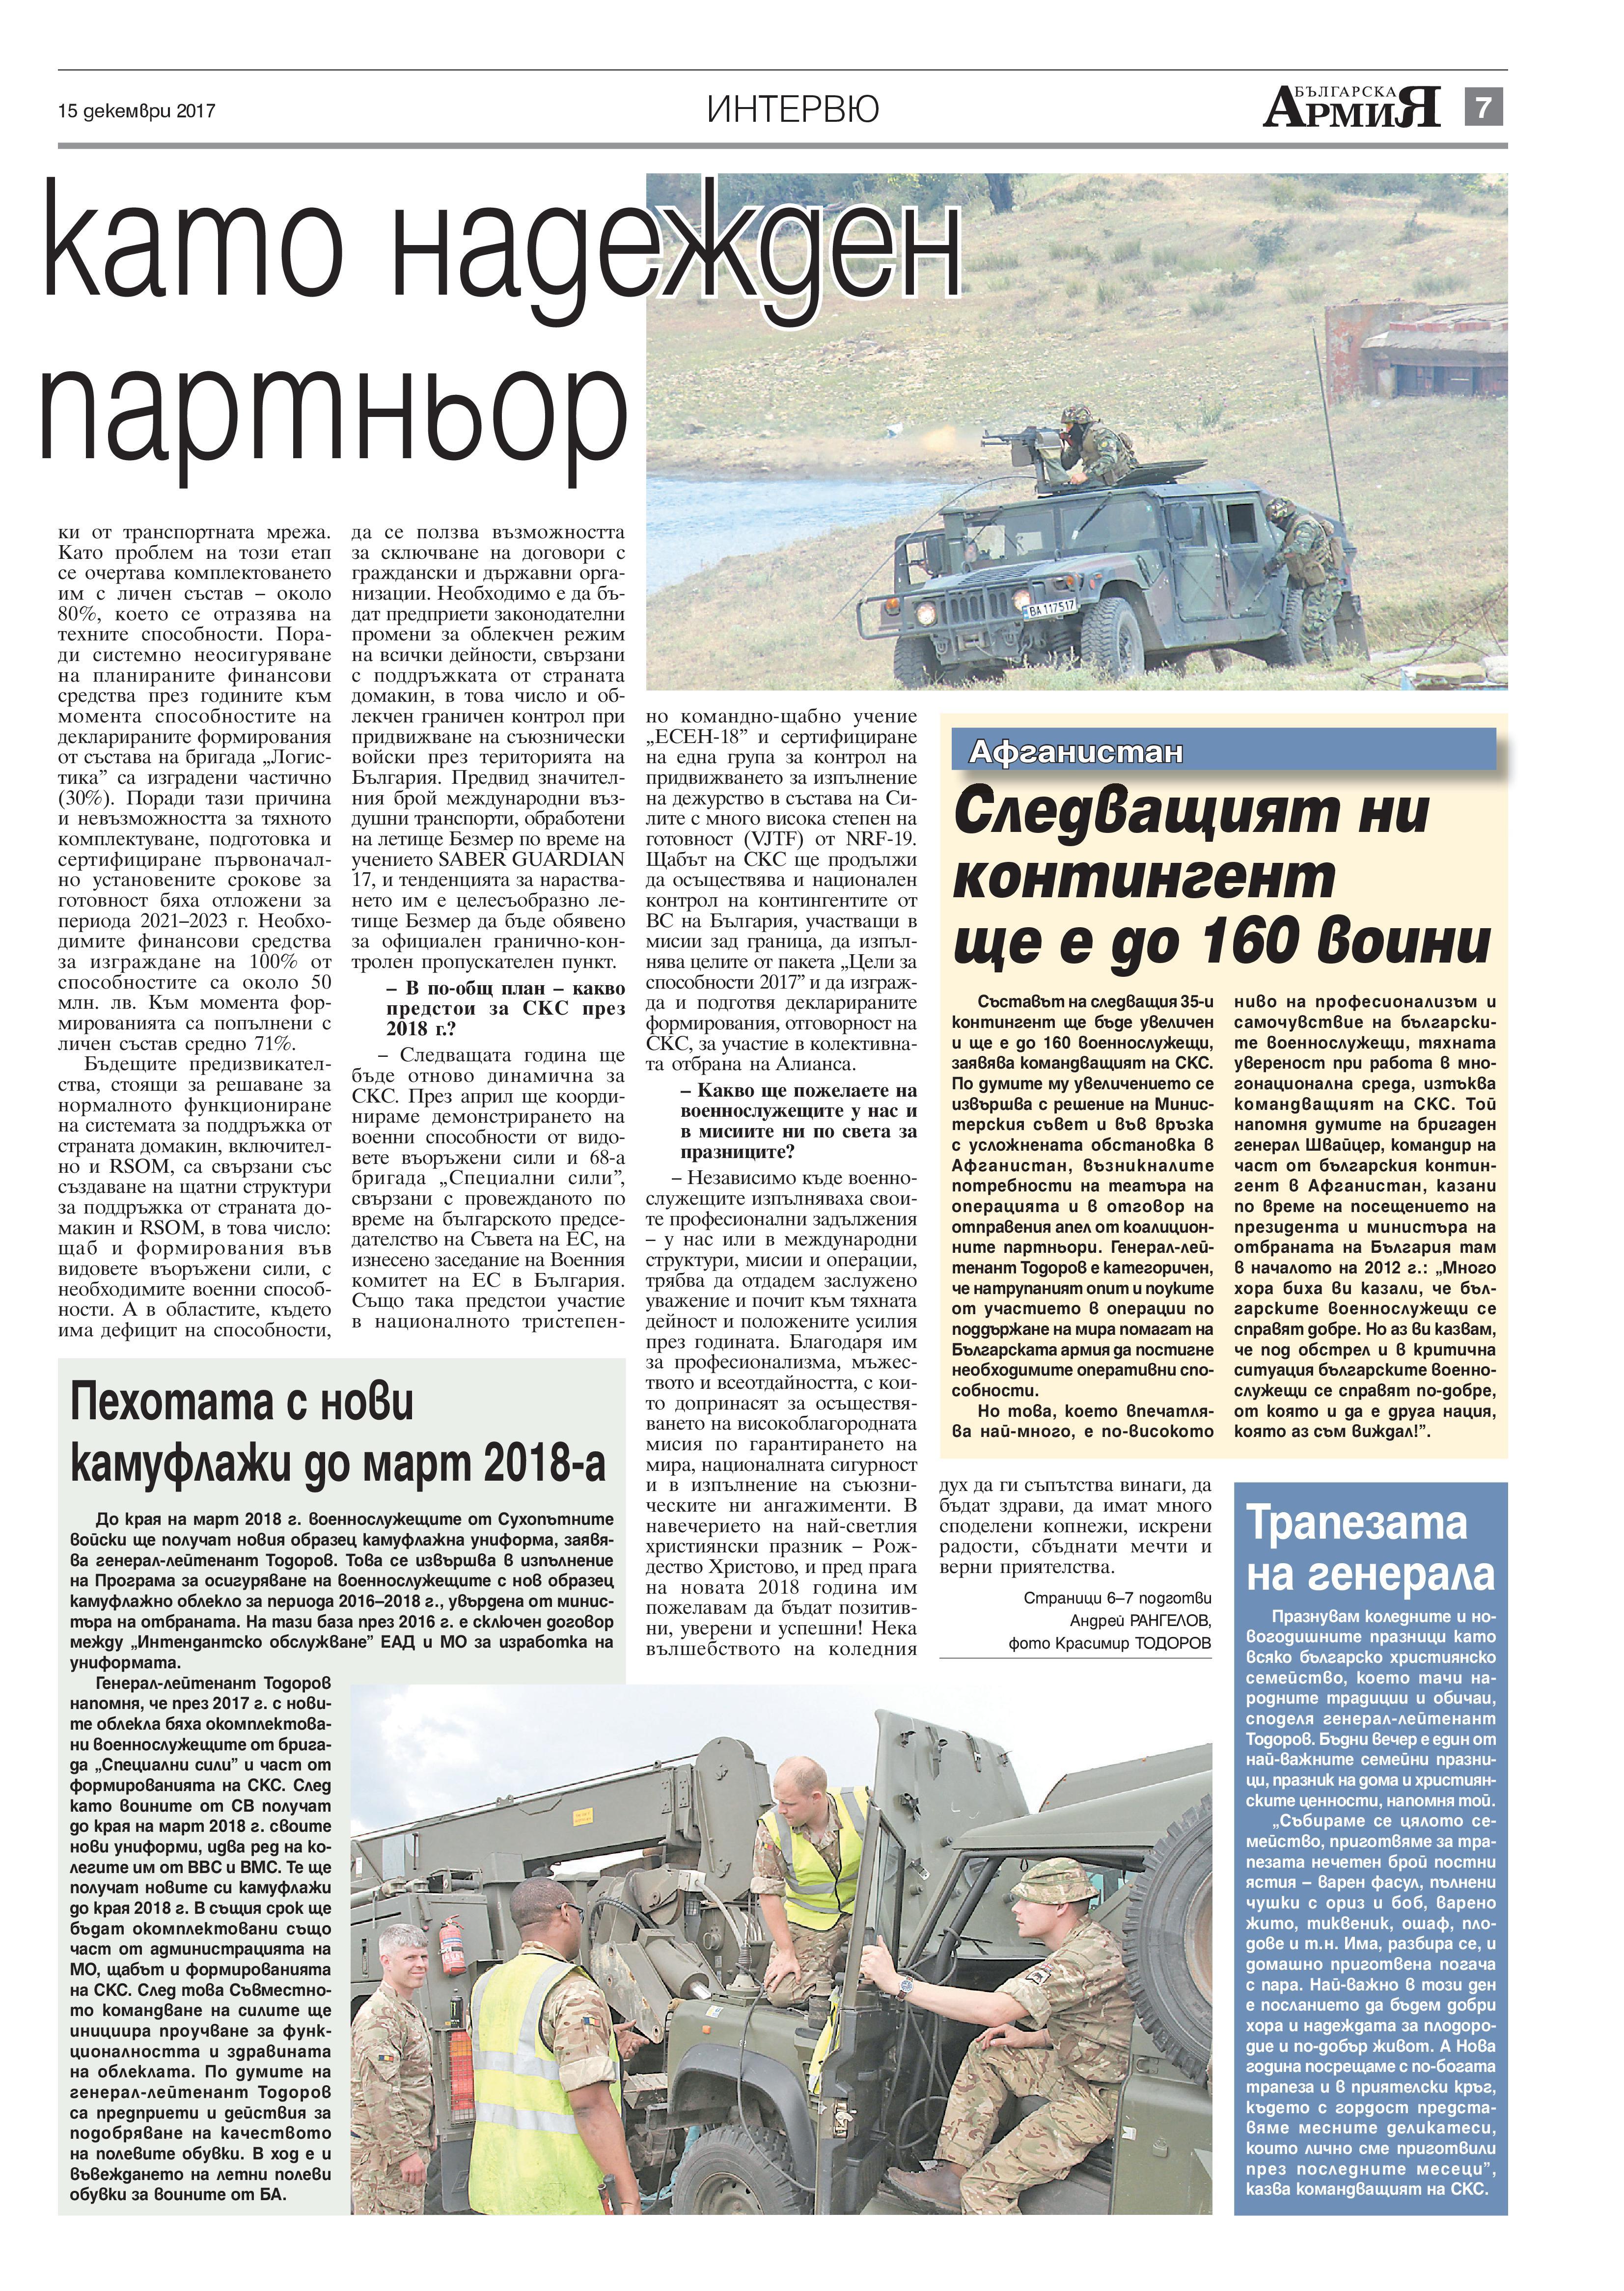 https://armymedia.bg/wp-content/uploads/2015/06/07-14.jpg